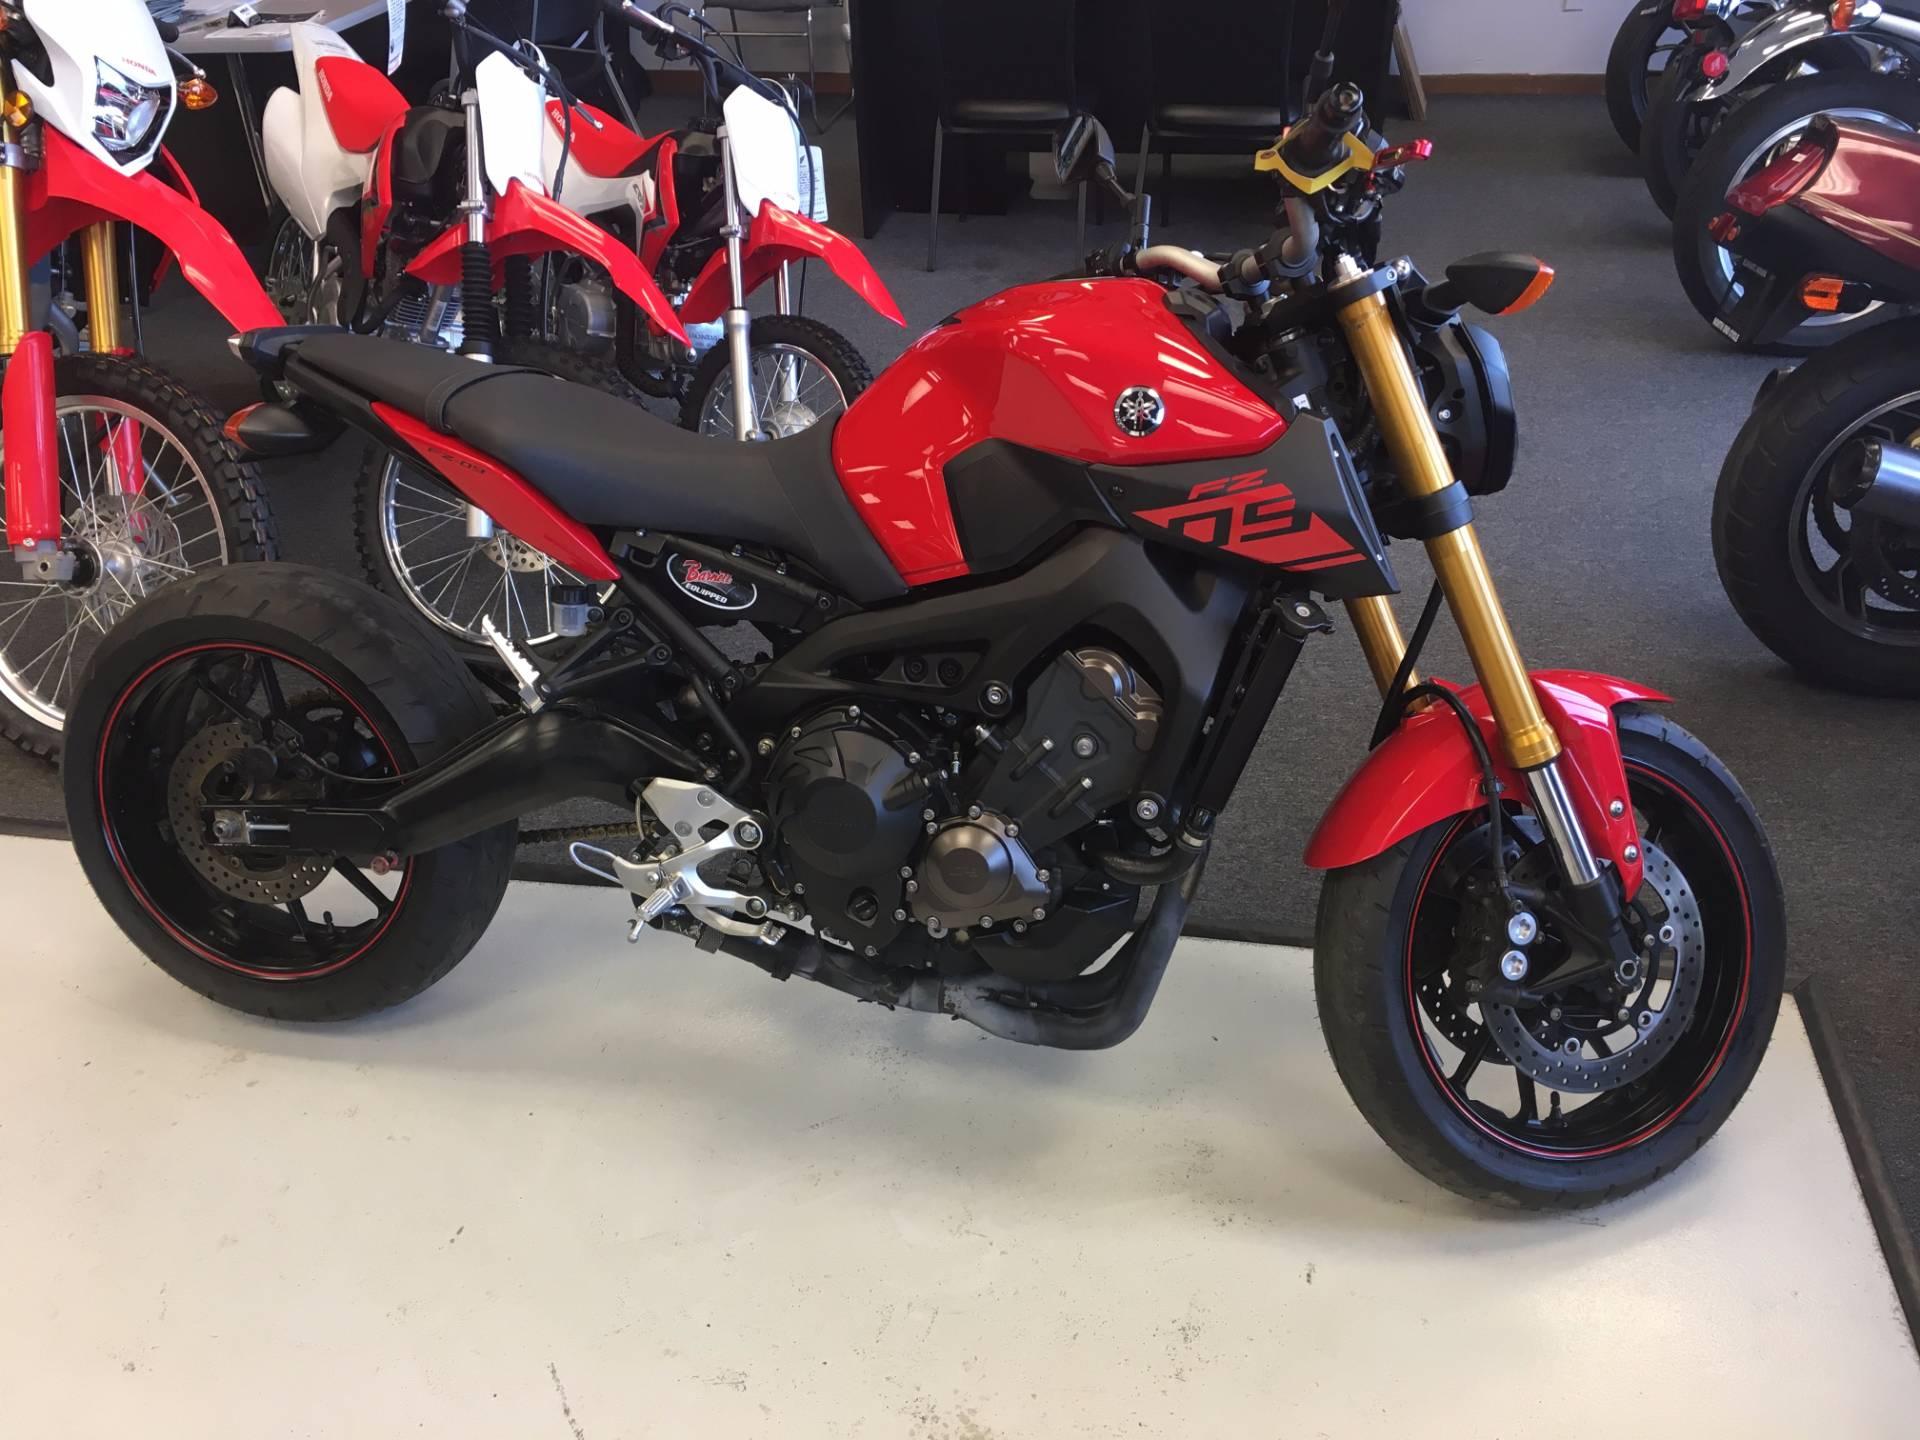 2014 Yamaha FZ-09 for sale 76469